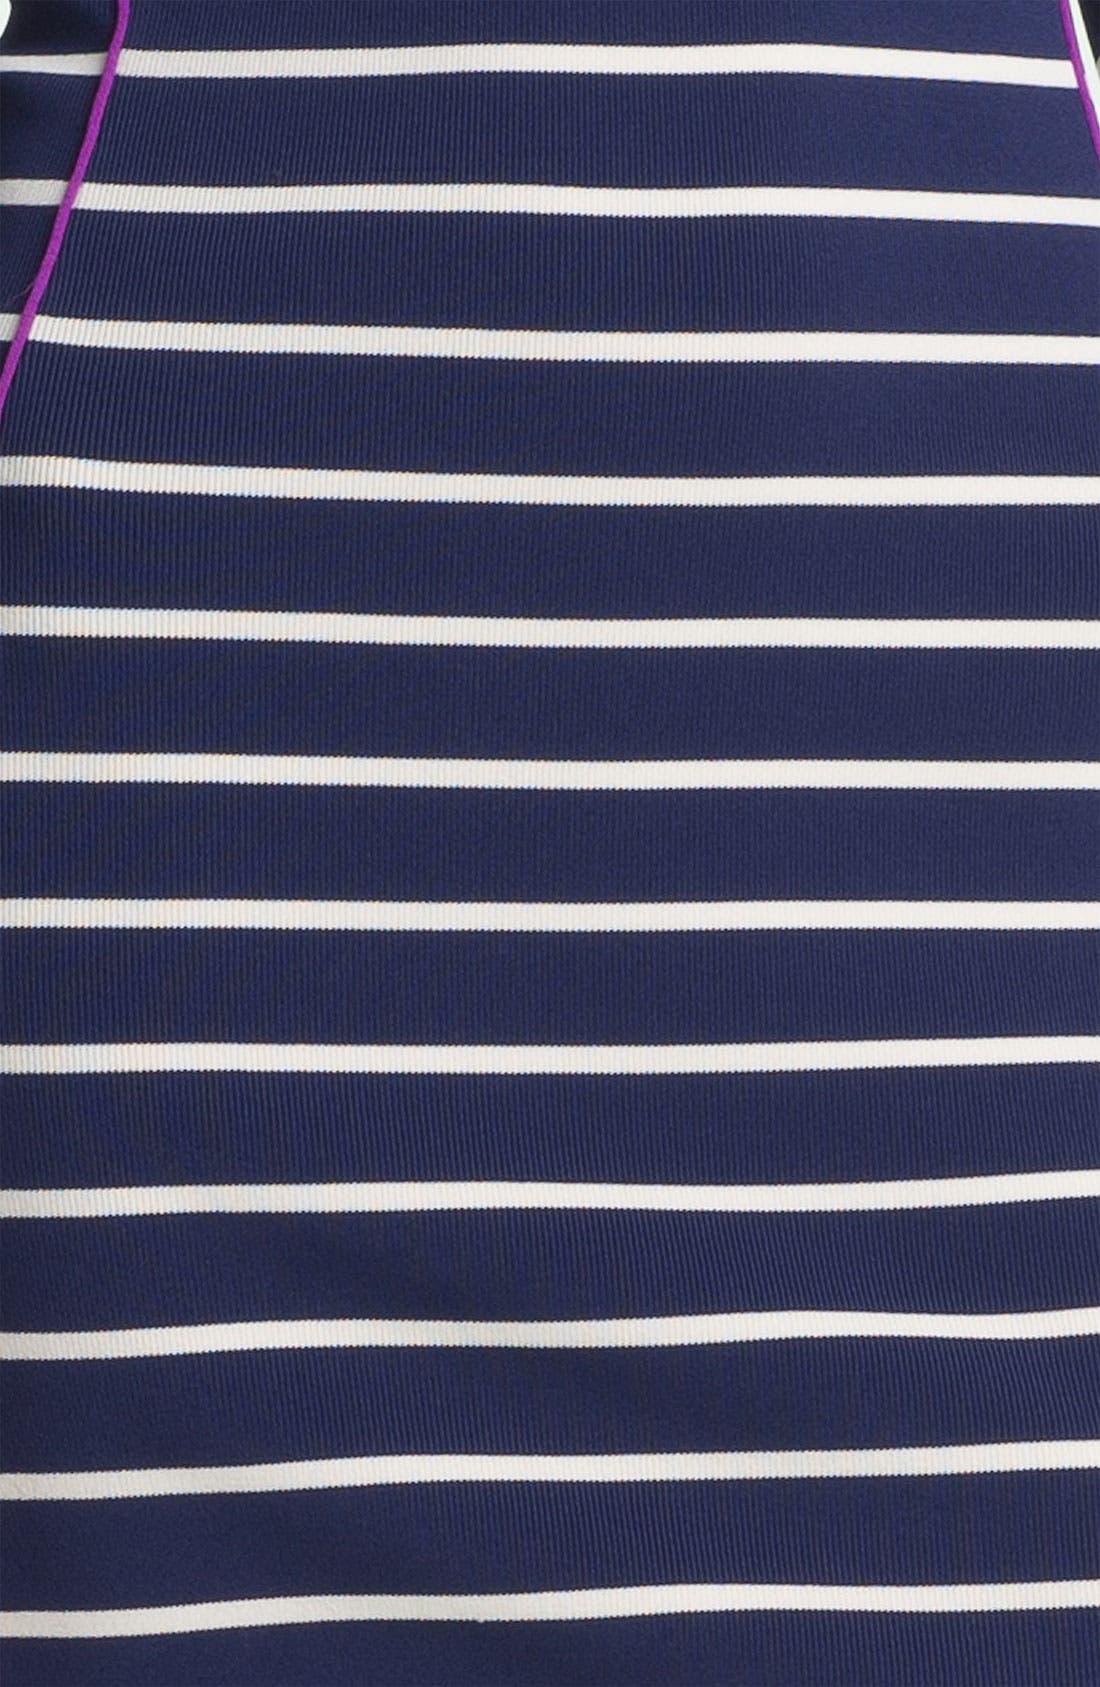 Alternate Image 3  - Jessica Simpson Contrast Trim Stripe Knit Sheath Dress